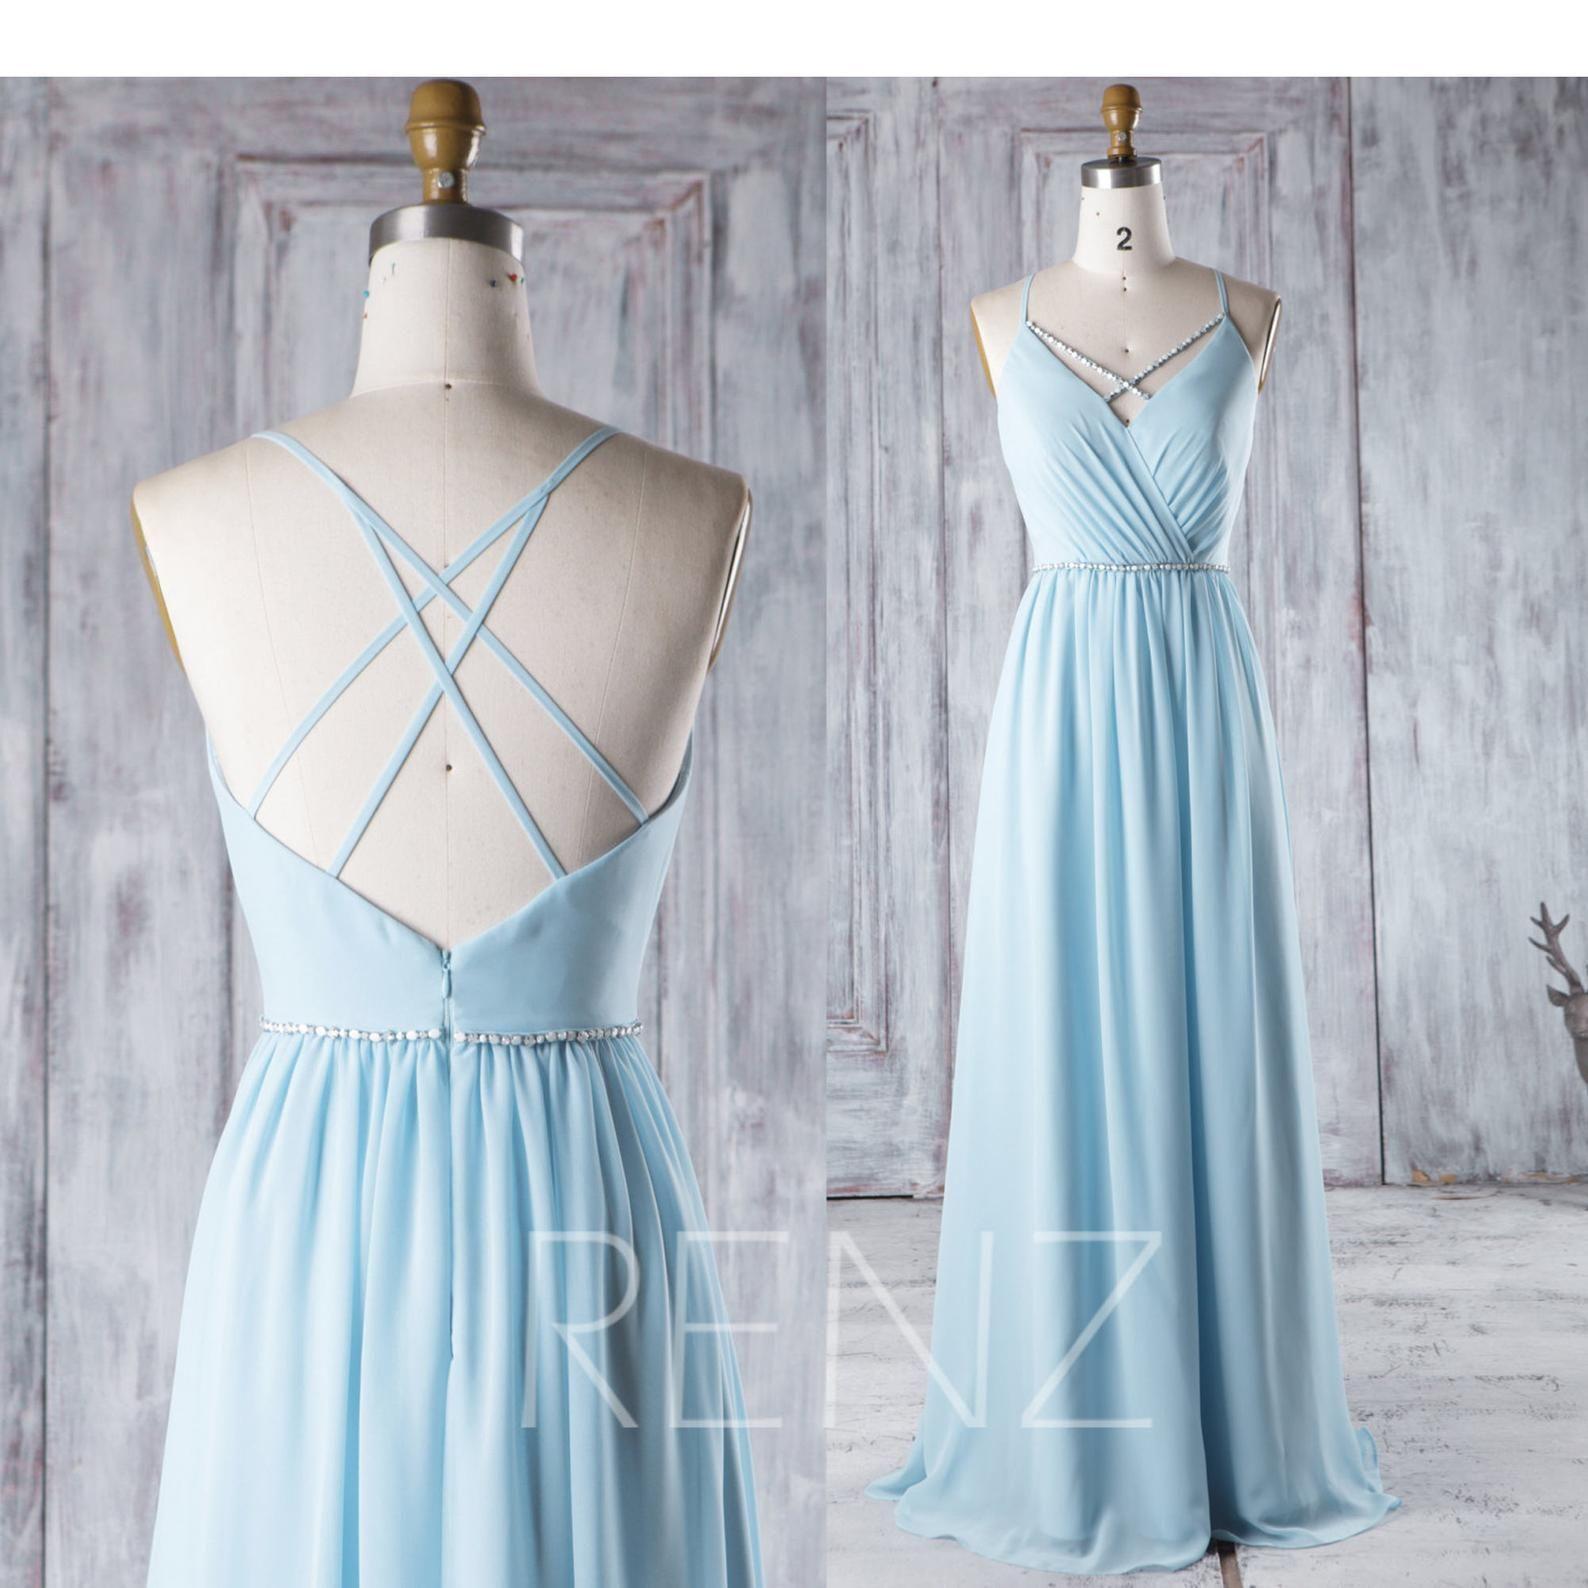 Bridesmaid dress light blue chiffon dress wedding dress